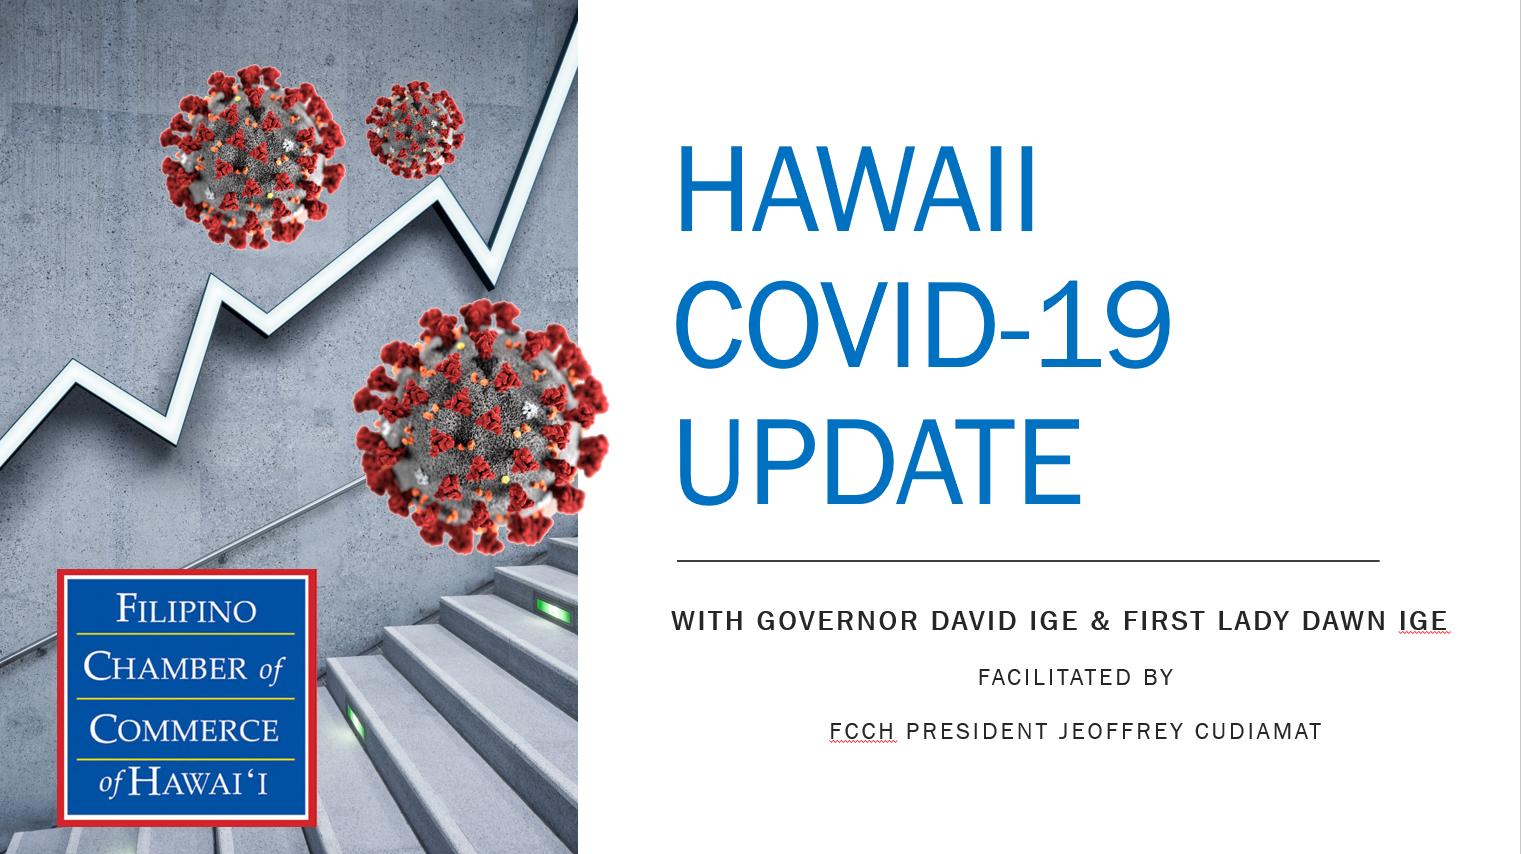 Hawaii Covid Update Cover